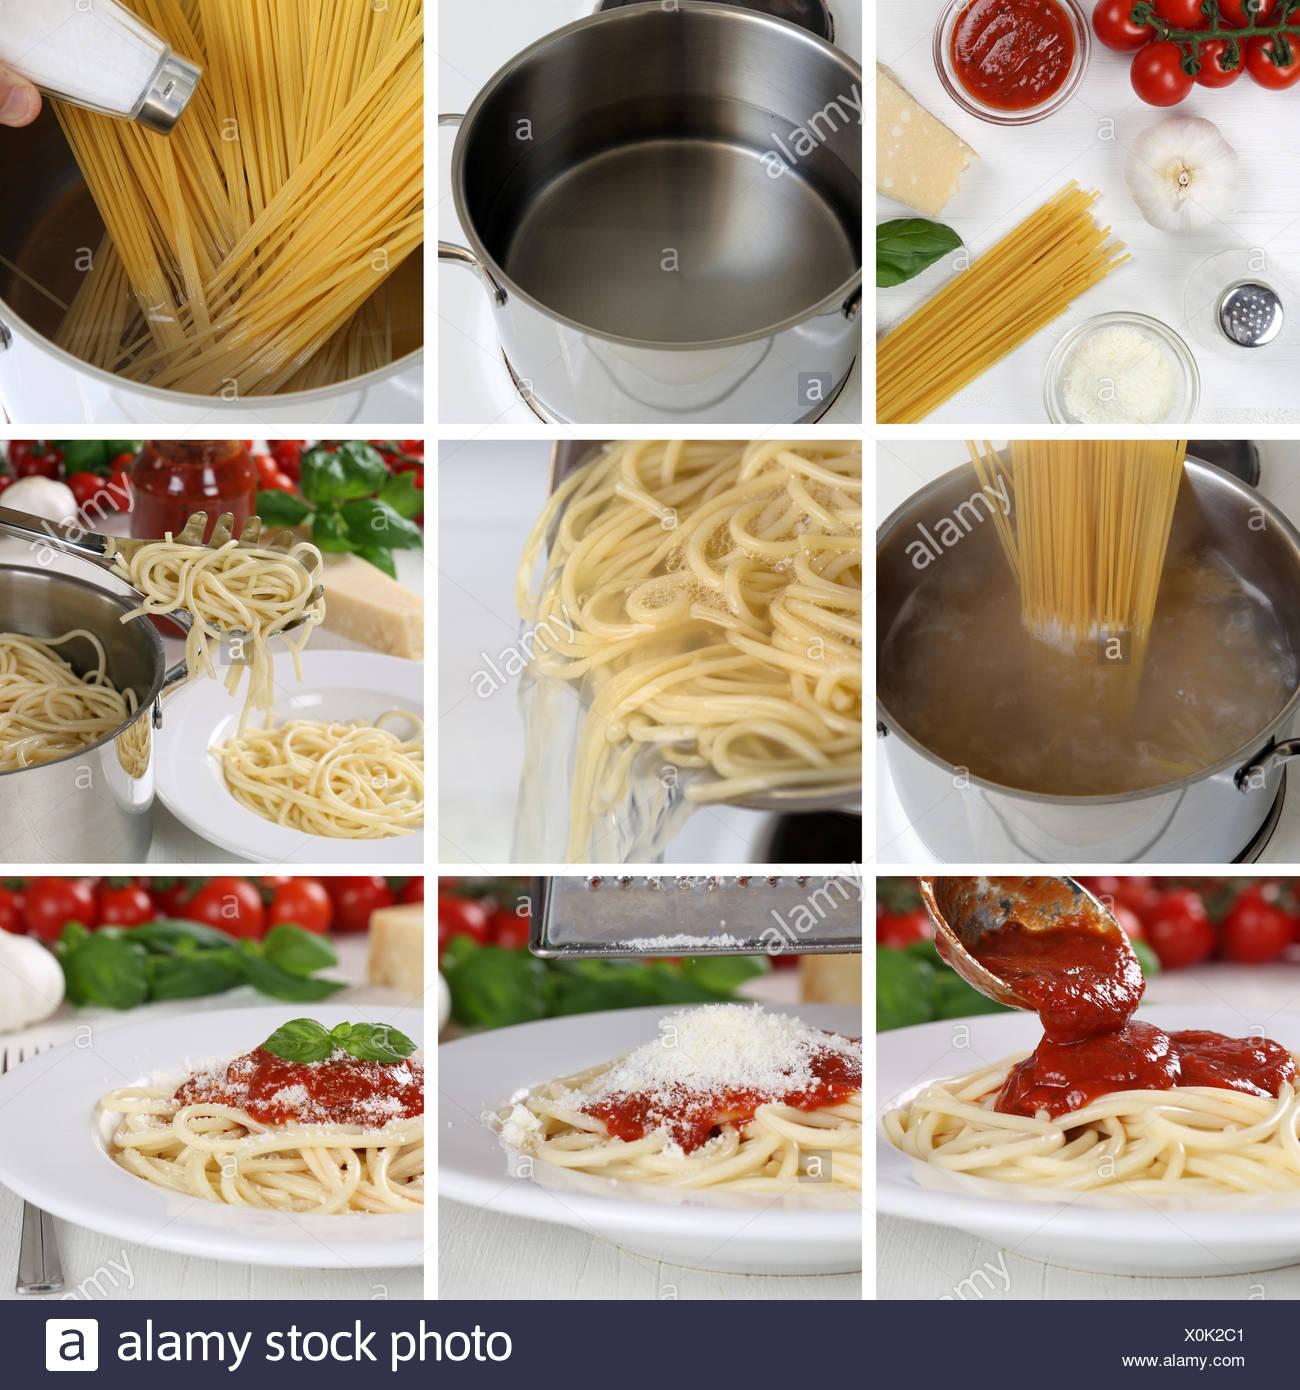 Spaghetti Nudeln Pasta Mit Tomaten Sauce Und Basilikum Kochen Anleitung Schritt F R Schritt Stock Photo Alamy